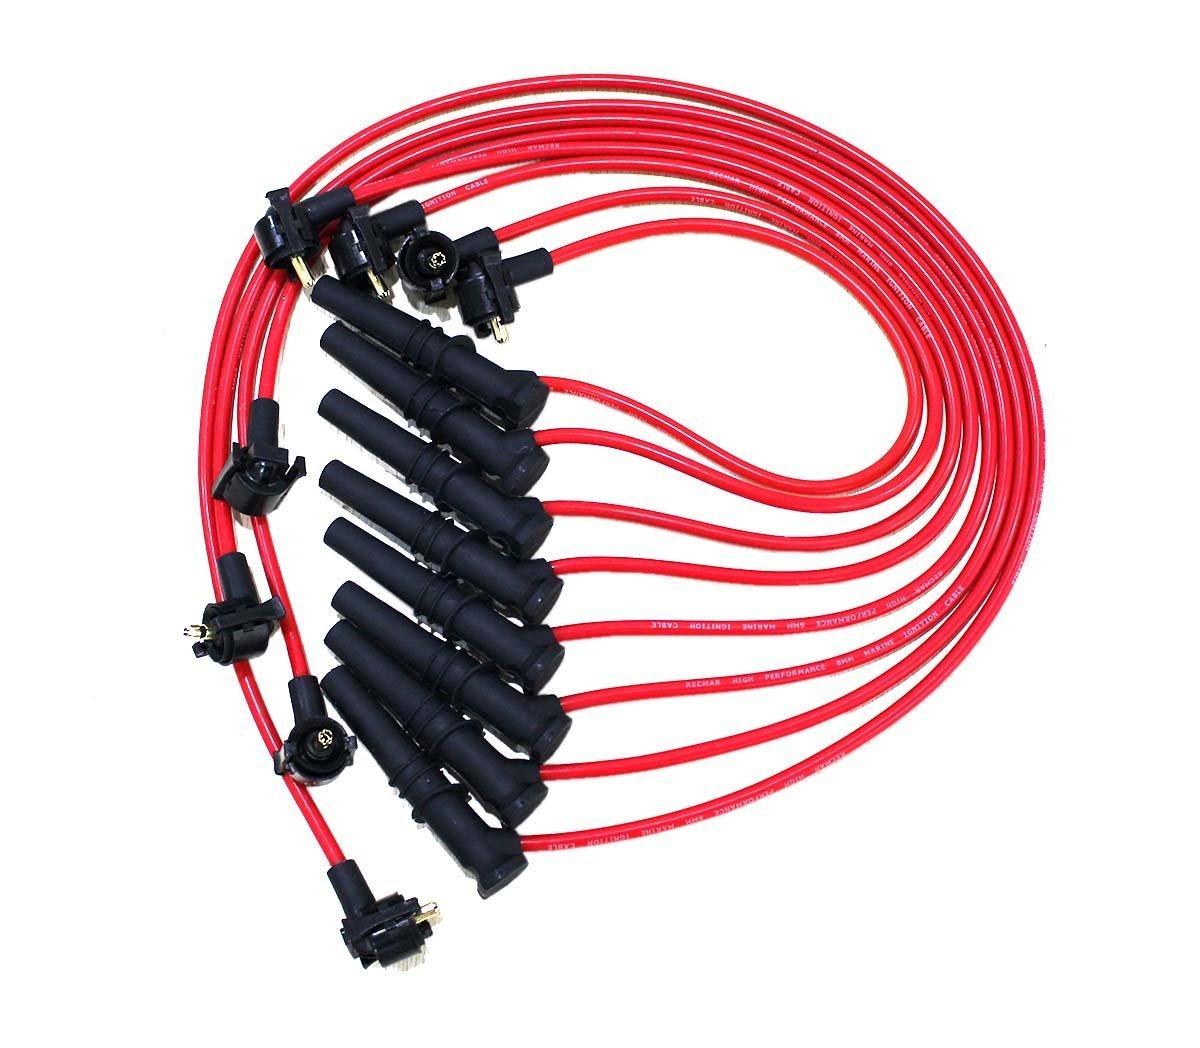 8 Pcs Spark Plug Wire Set For Ford Lincoln Mercury F-150 F250 V8 4.6L JEM&JULES